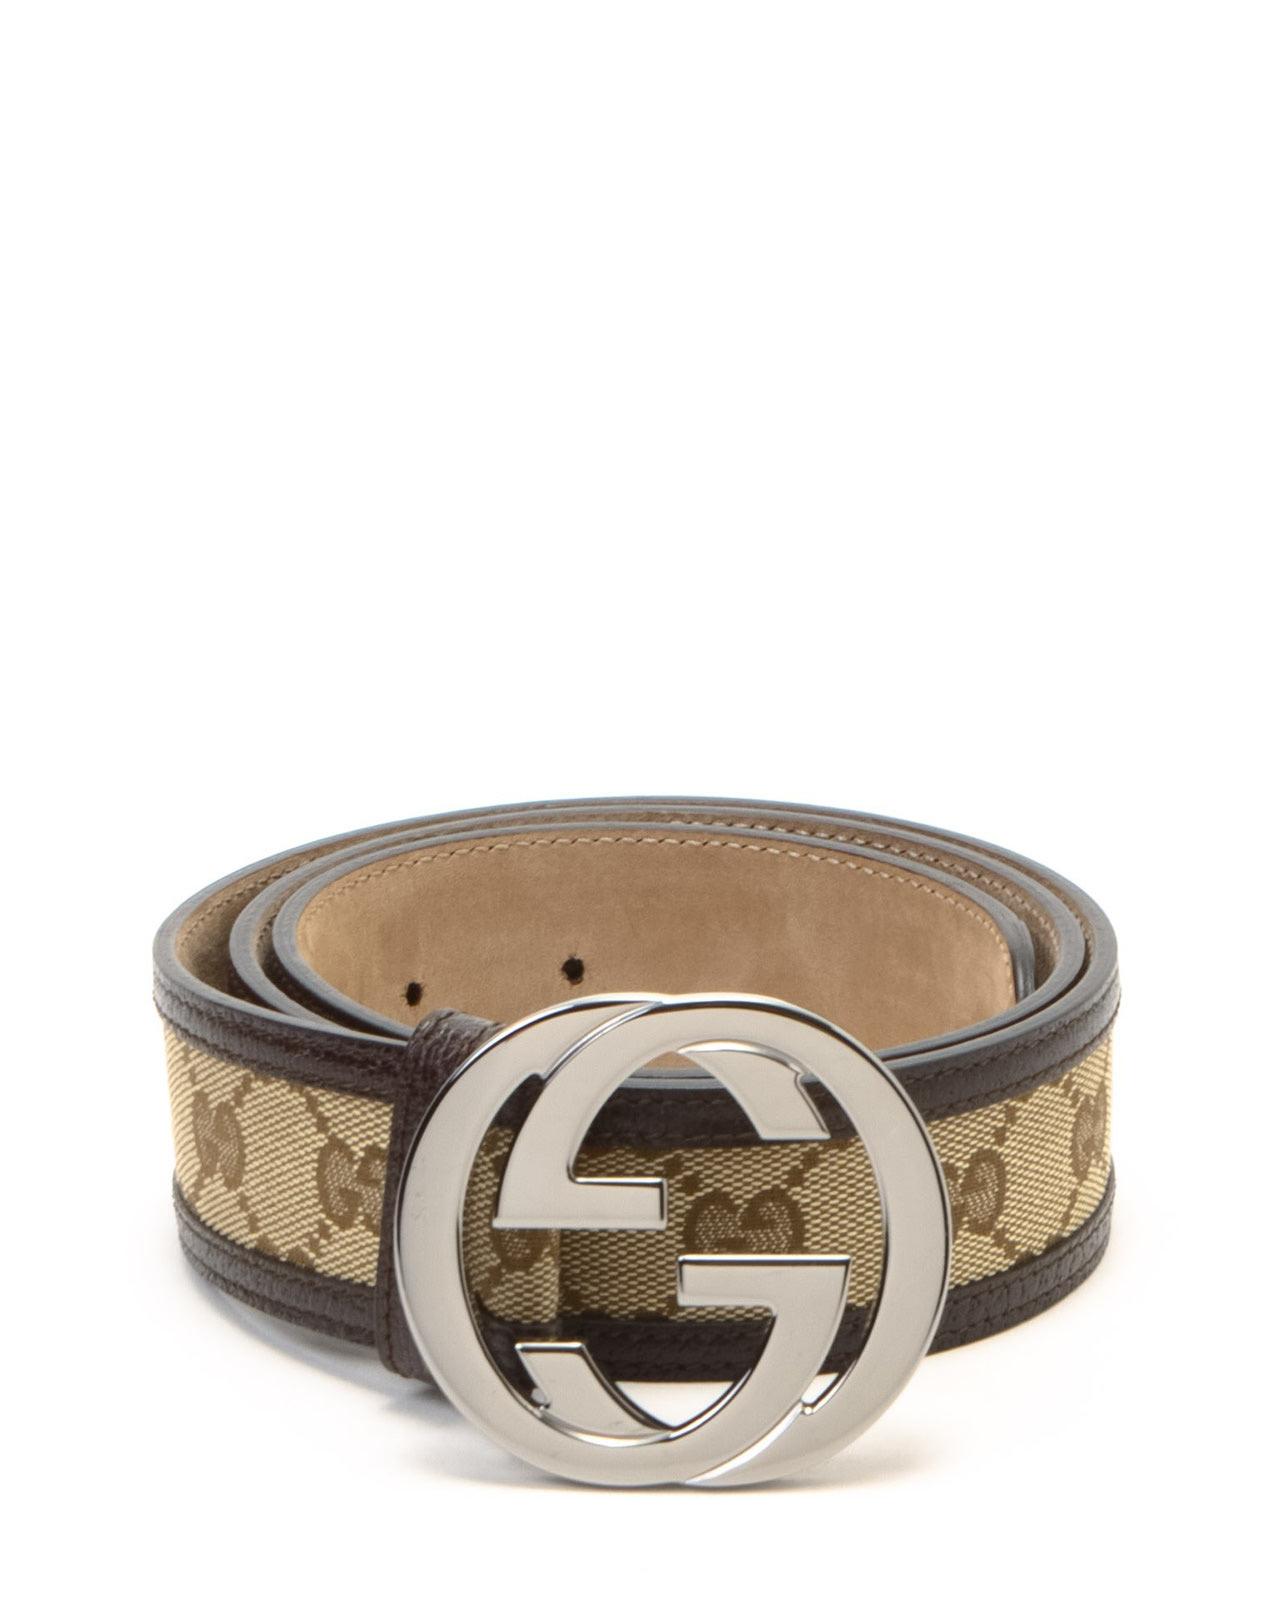 28685e2e83f Lyst - Gucci Belt in Natural for Men